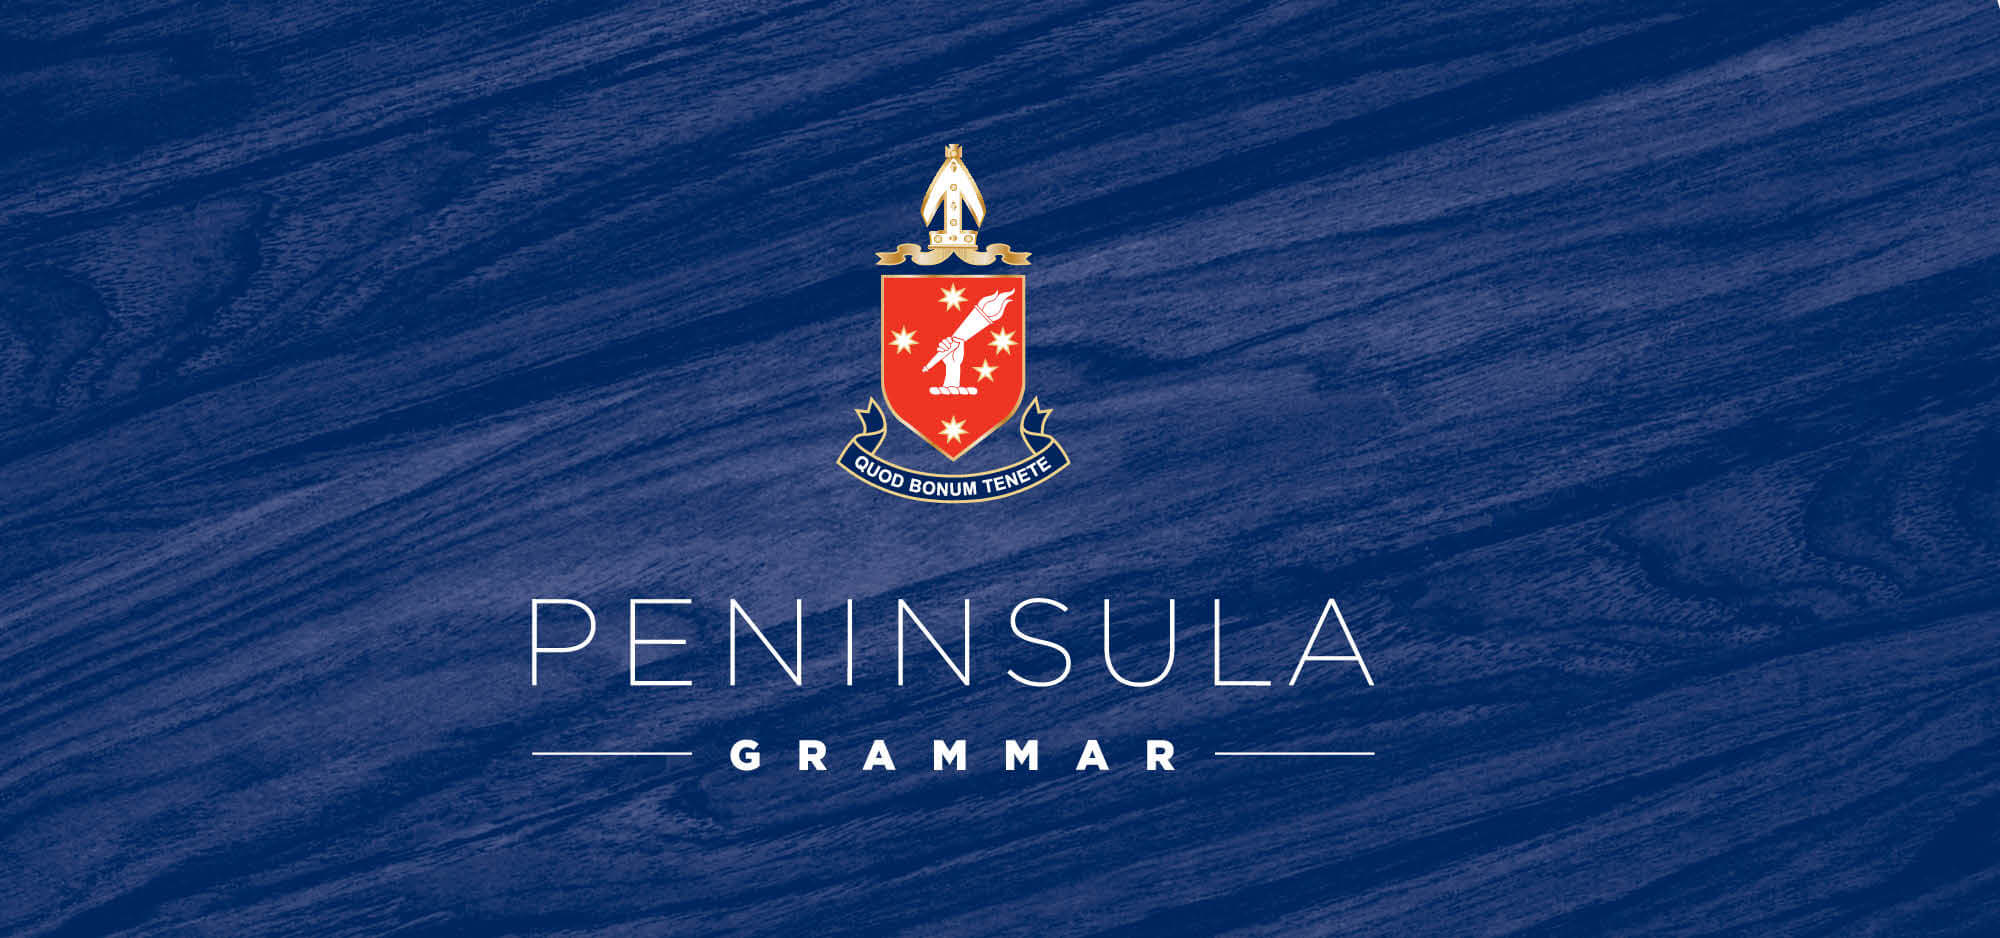 Peninsula Grammar Logo Design